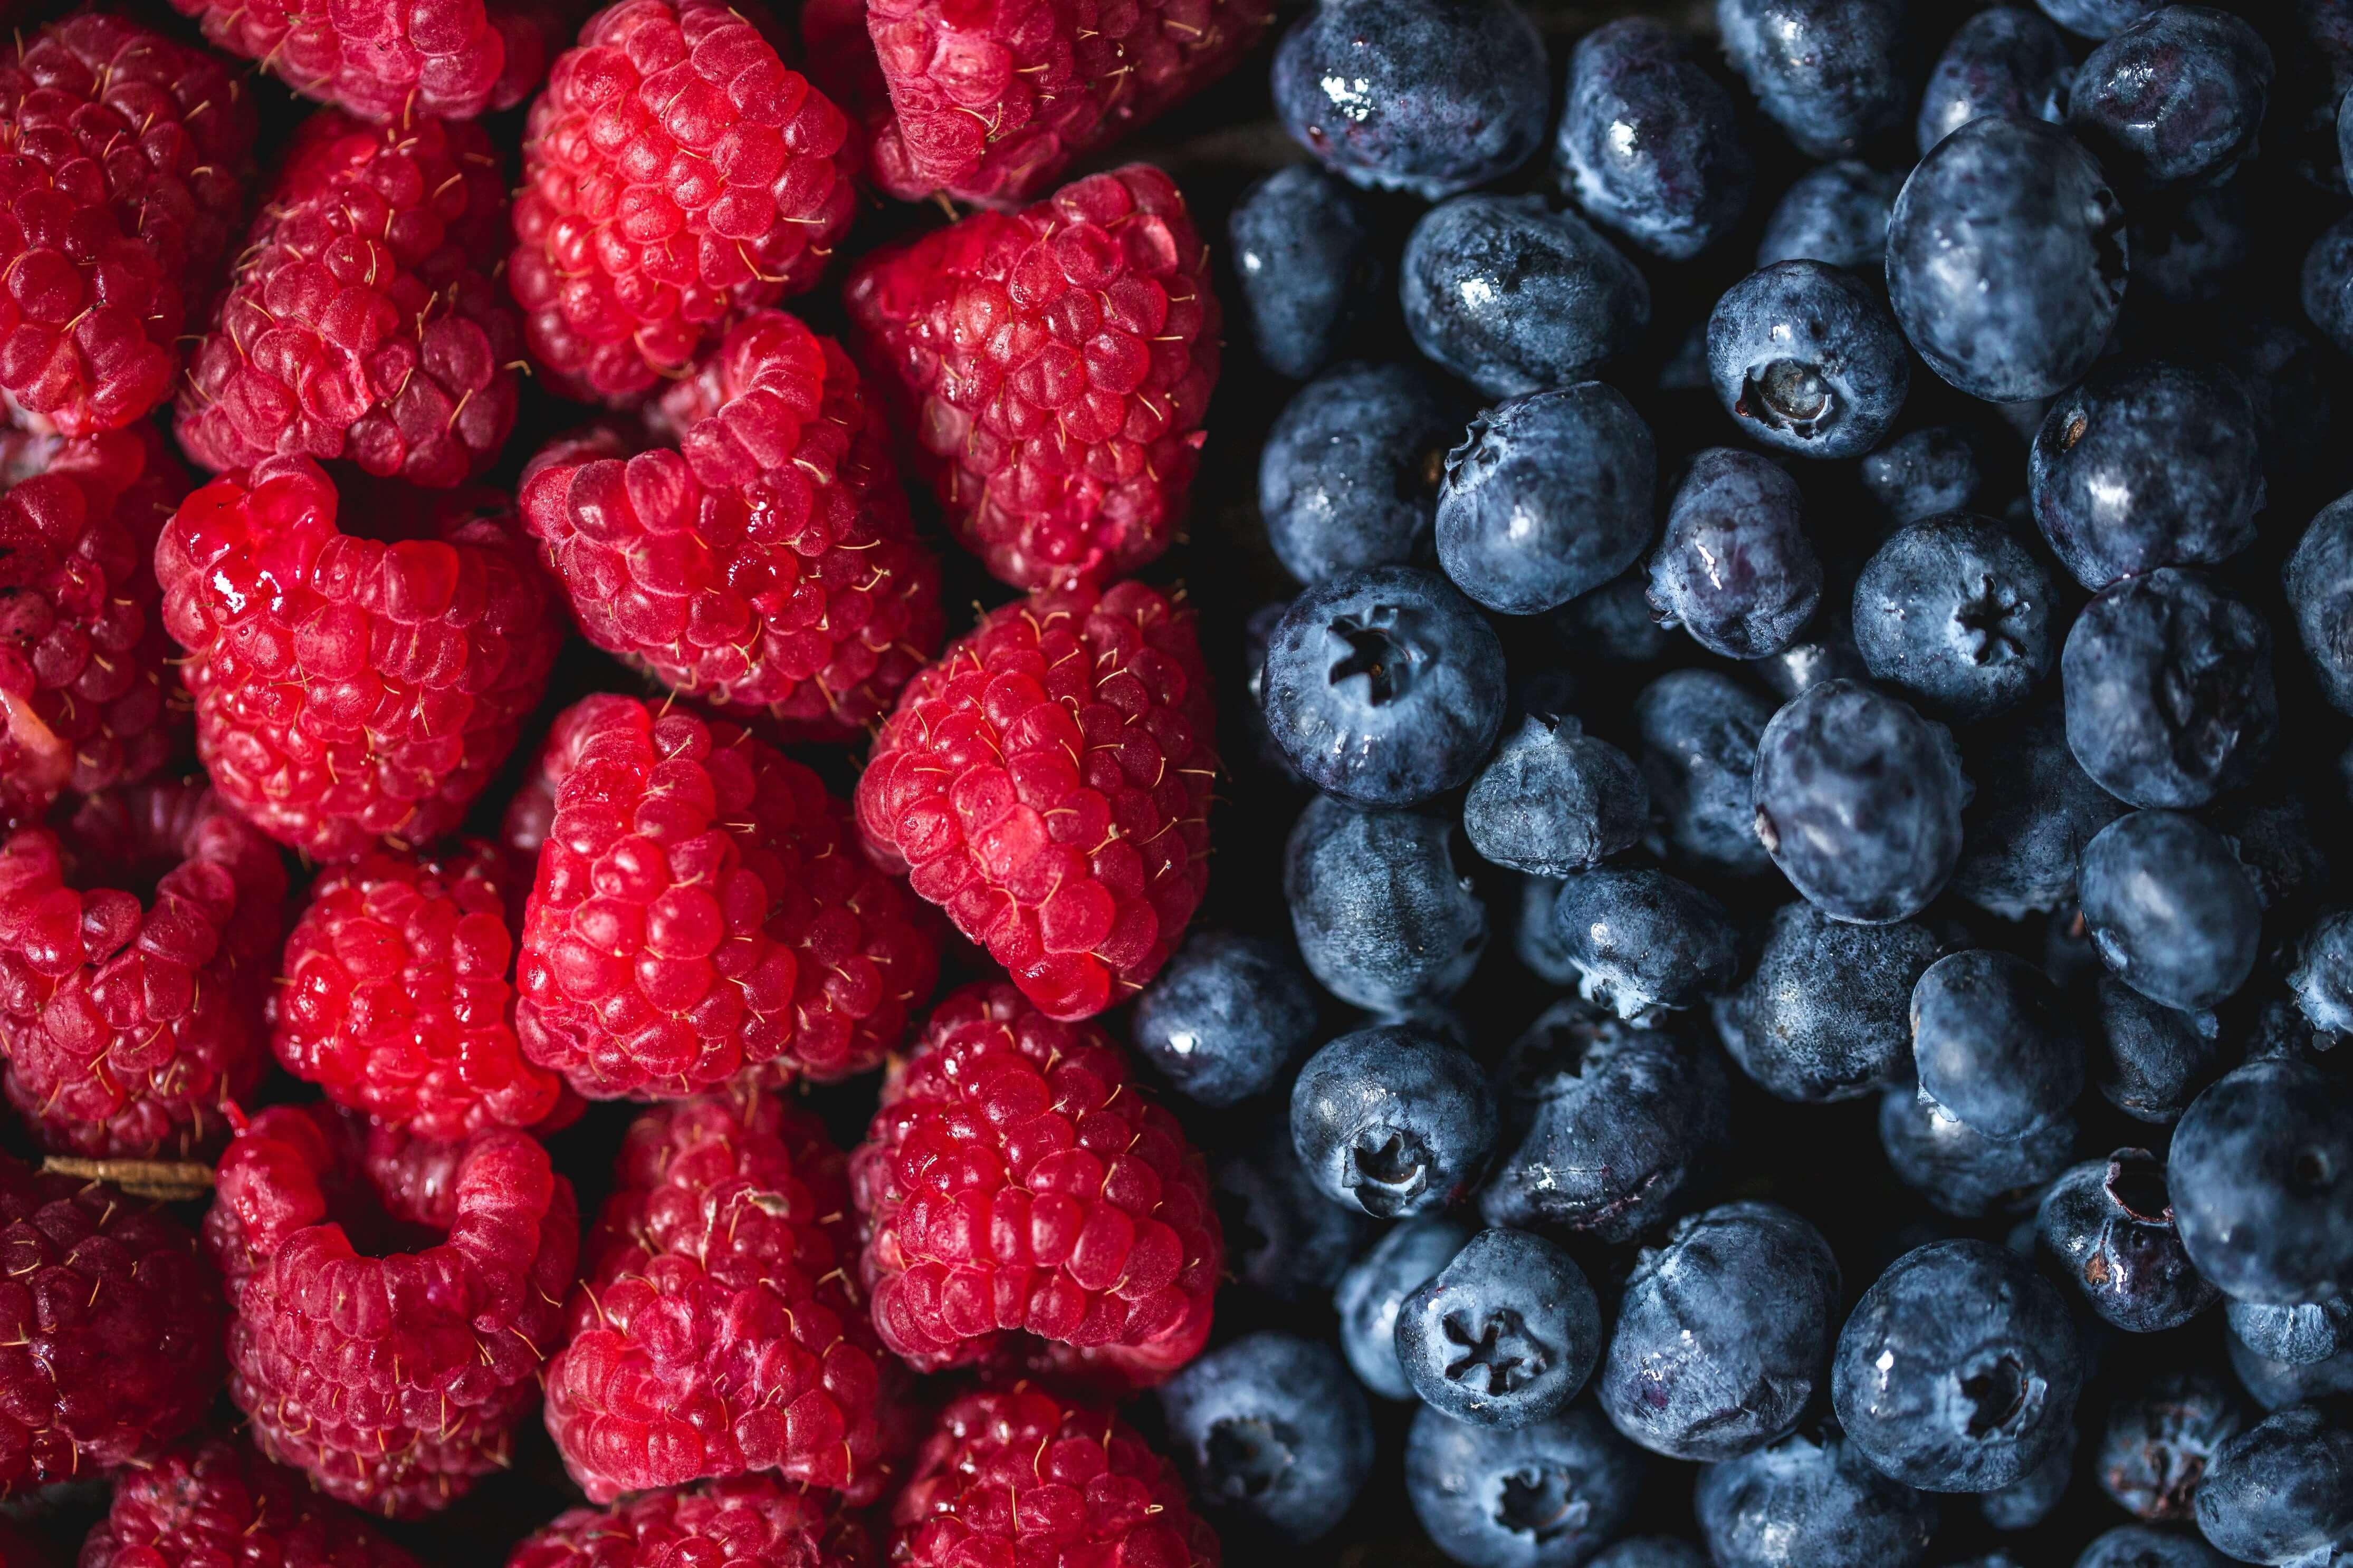 berries-pile-texture-1